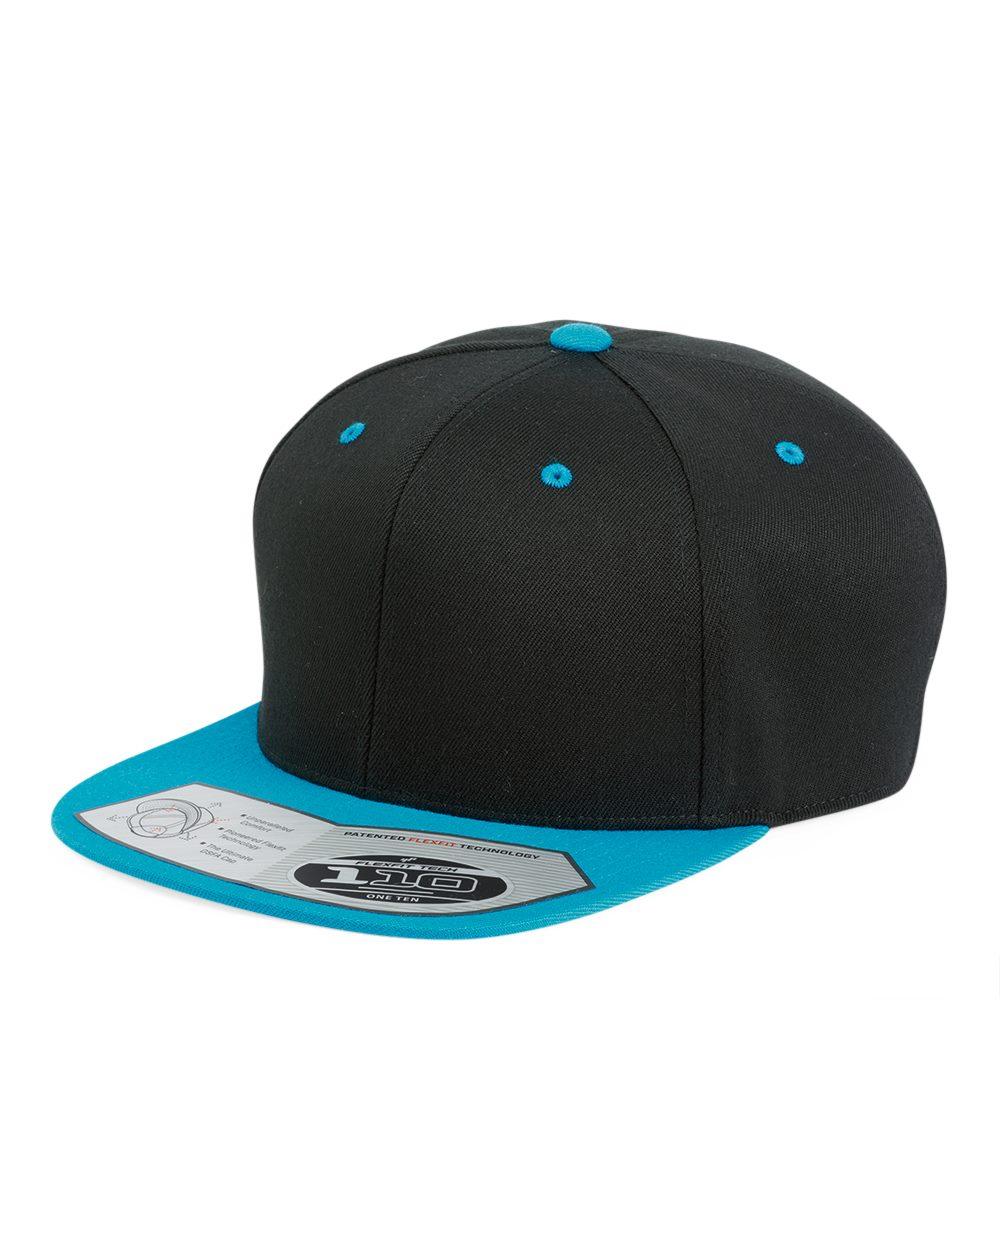 Flexfit 110F - Flat Bill Snapback Cap